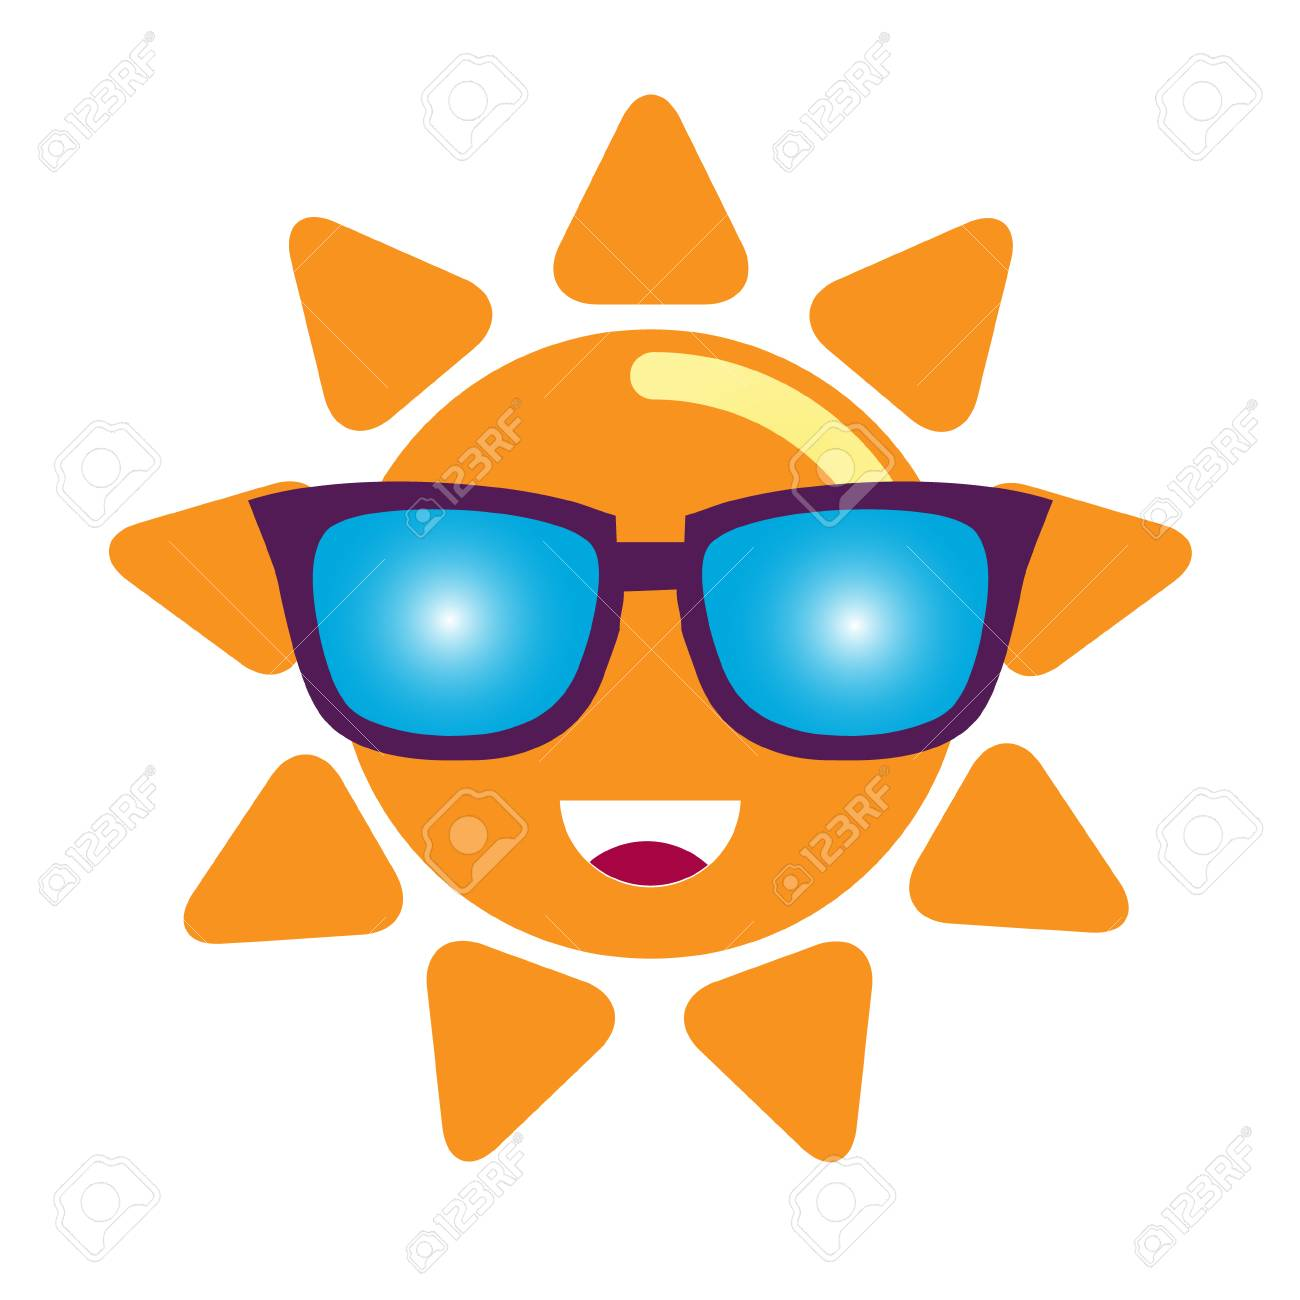 19e4b588d5 Cartoon Smiling Sun In Sunglasses Character. Vector Illustration ...